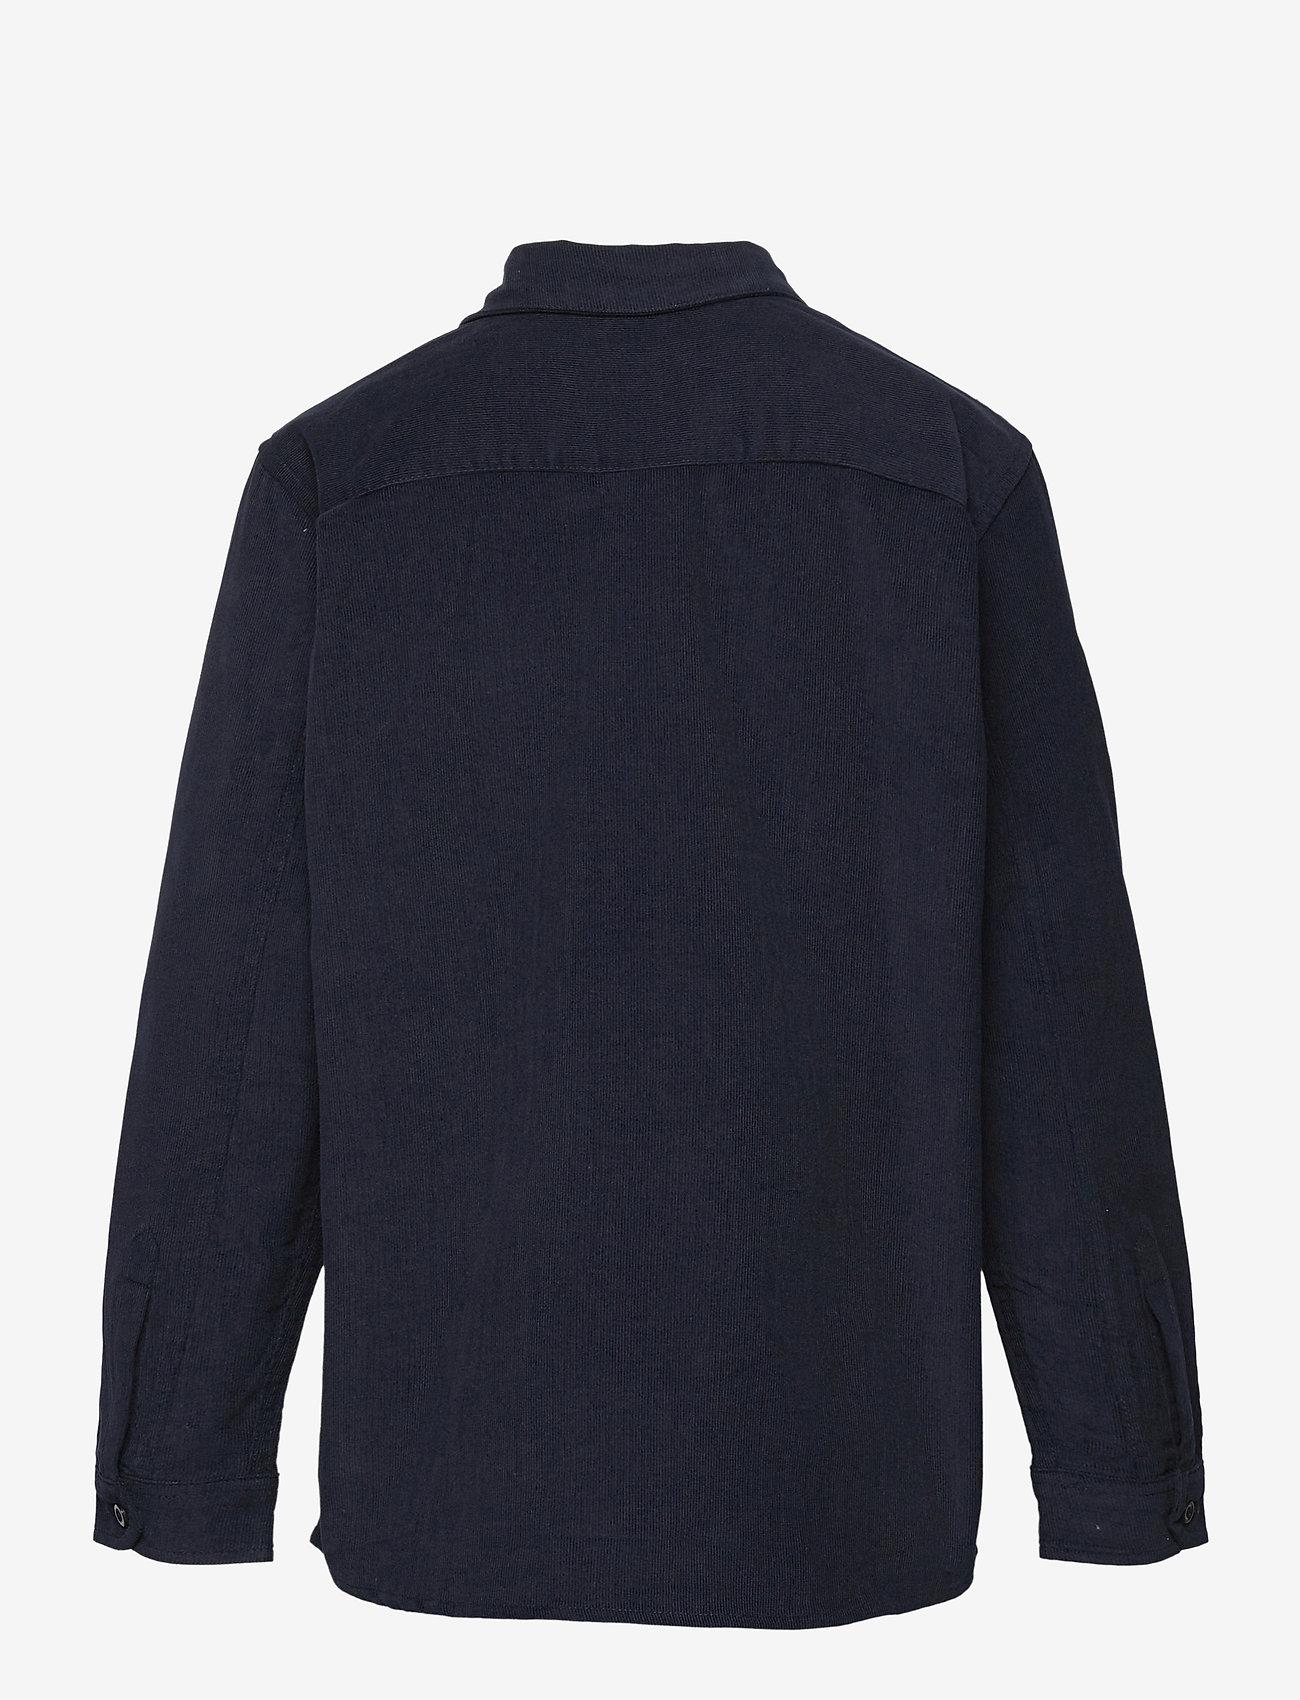 Mads Nørgaard - Dyed Baby Cord Svantini - shirts - parisian night - 1